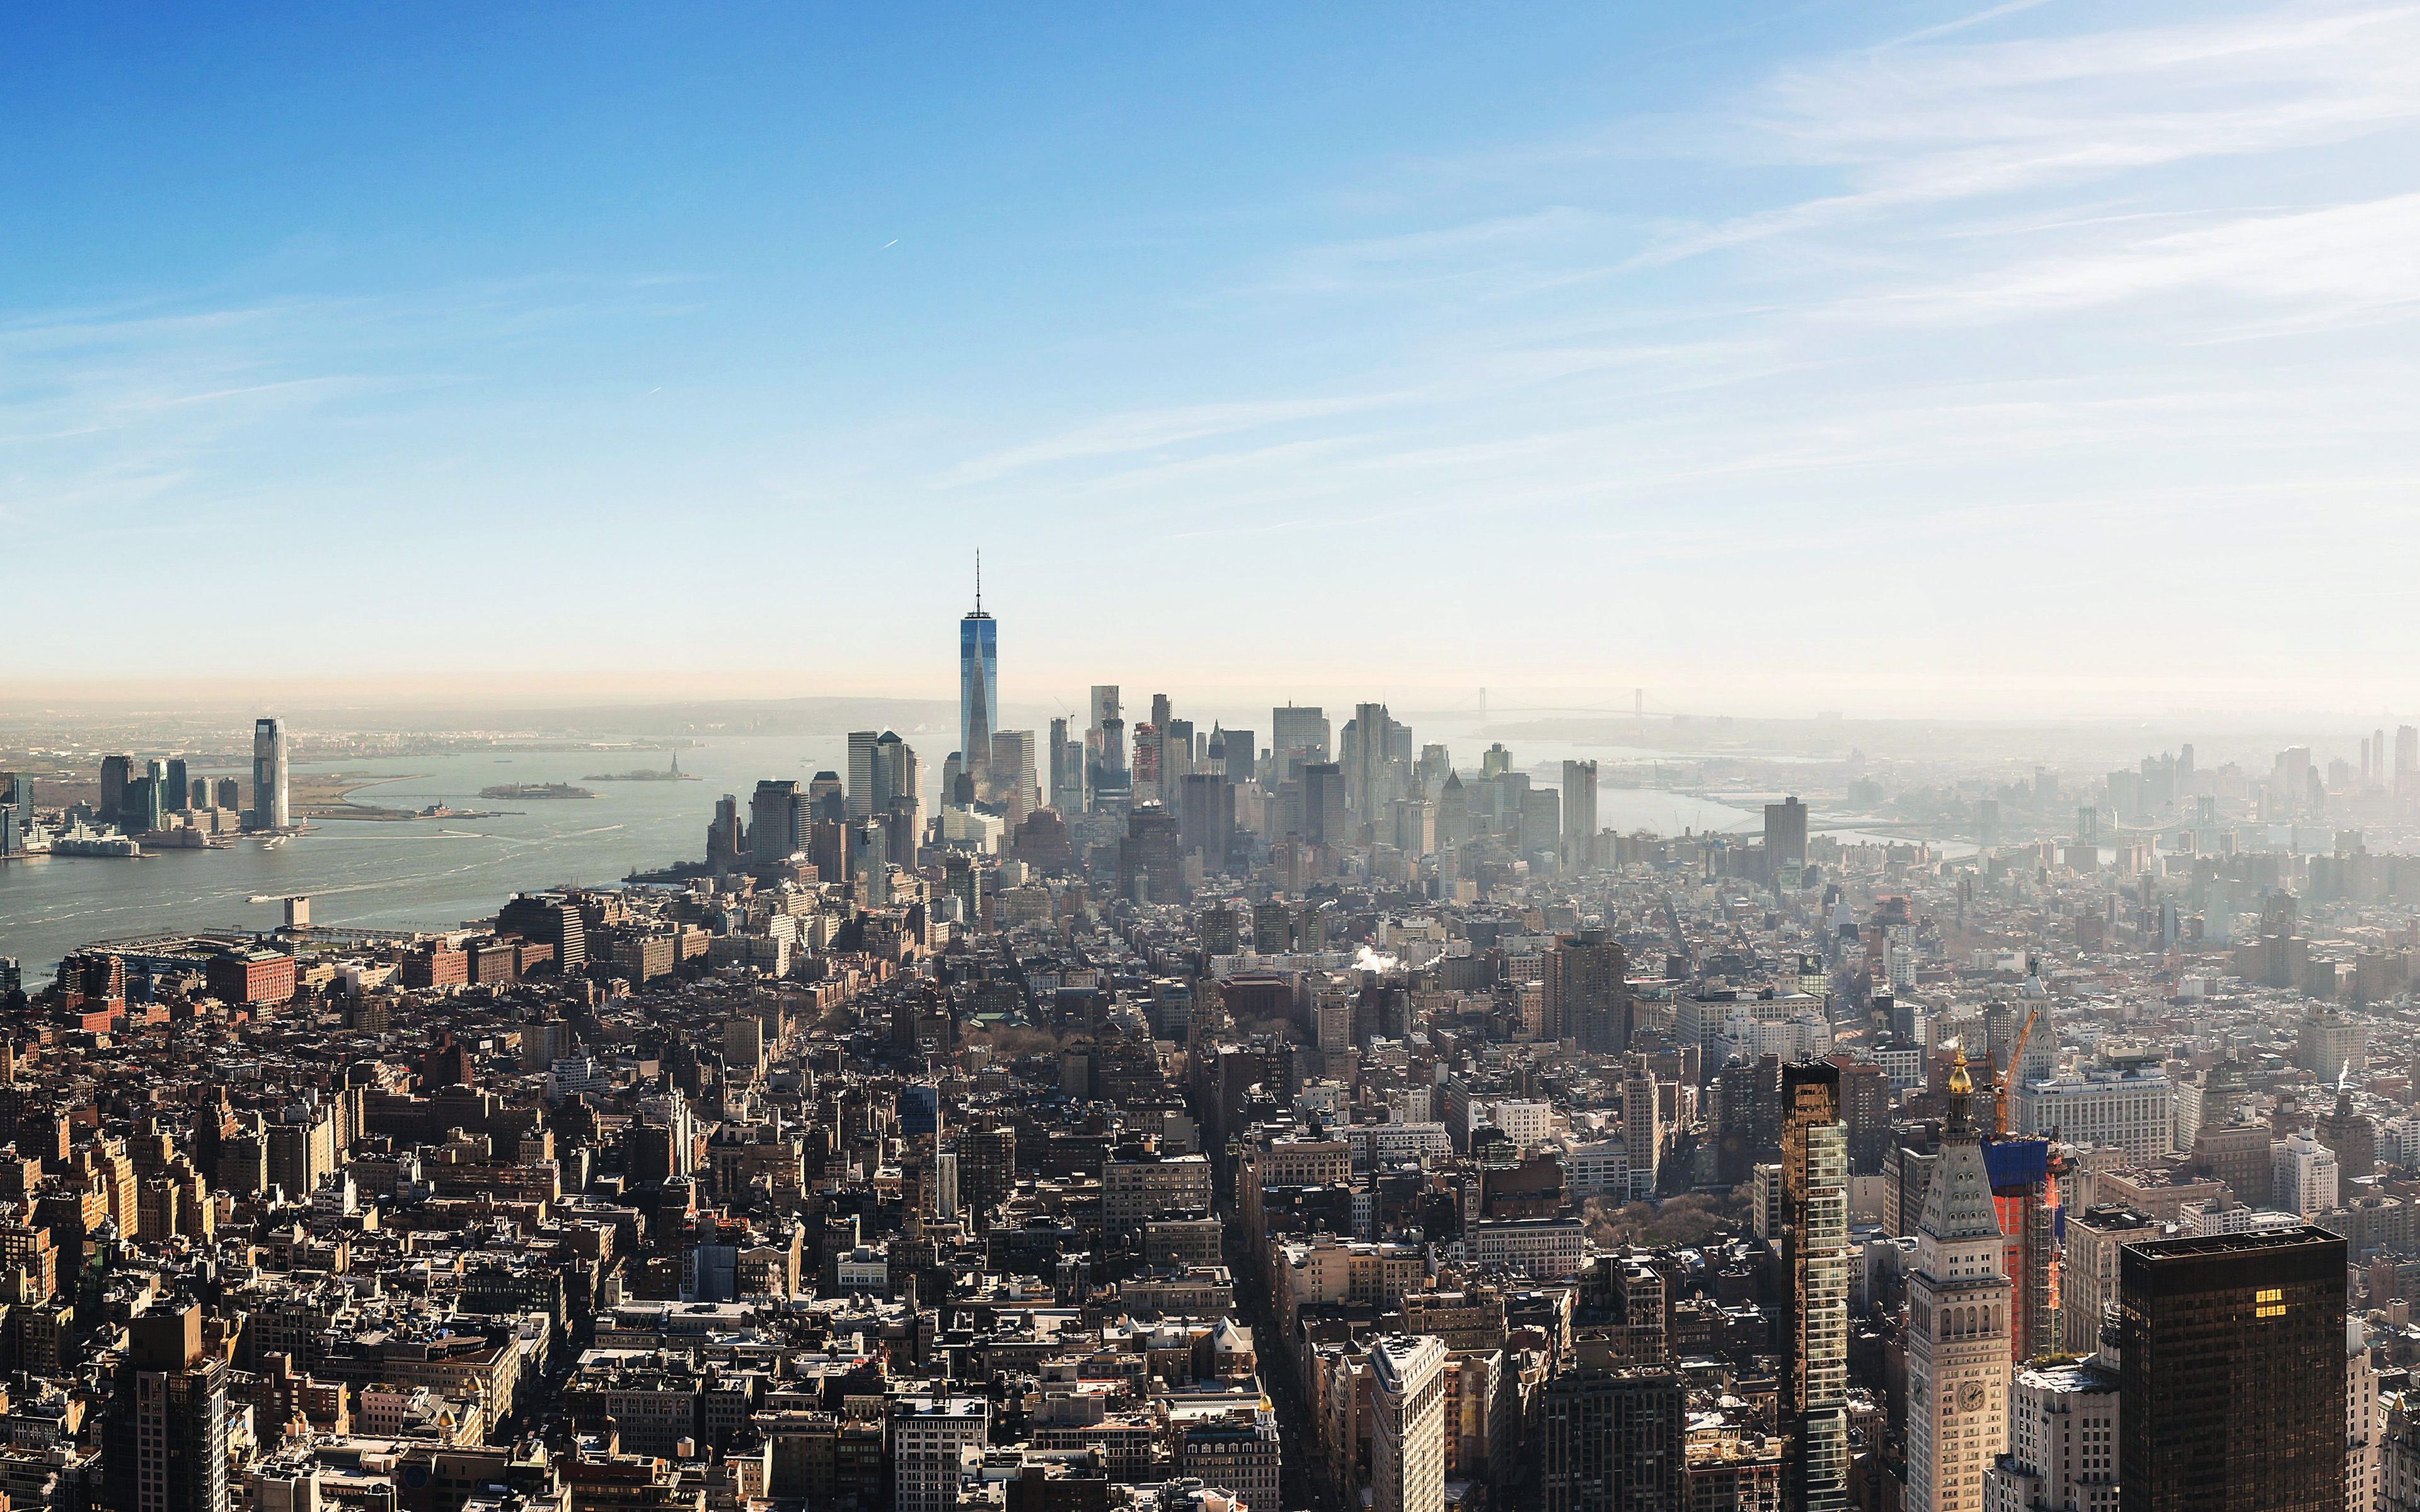 Nk59 City View Newyork Fly Wallpaper